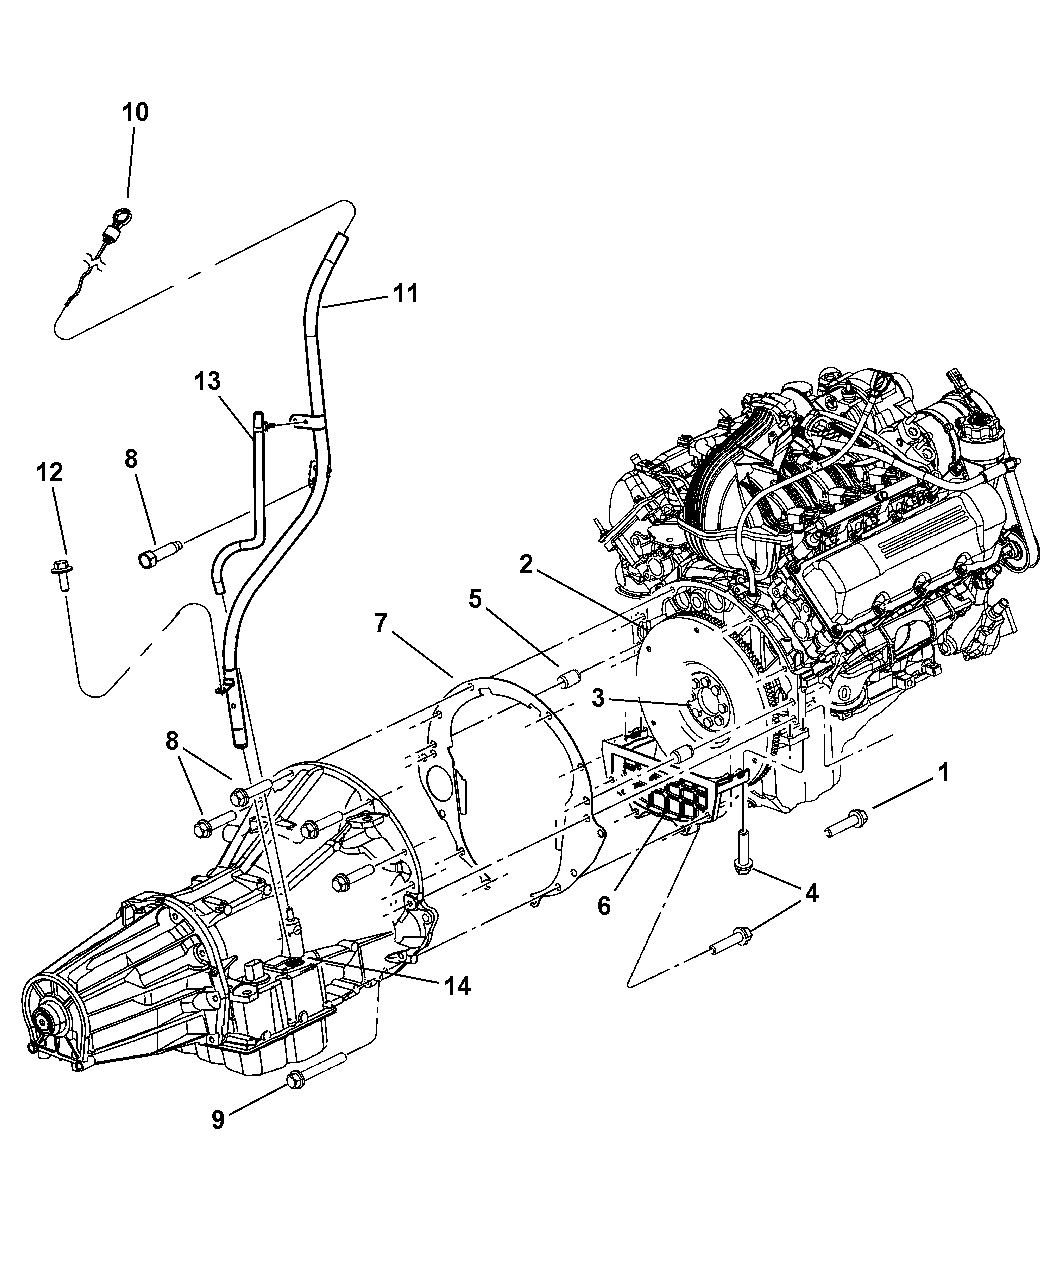 53013592AB - Genuine Mopar INDICATOR-TRANSMISSION FLUID LEVEL